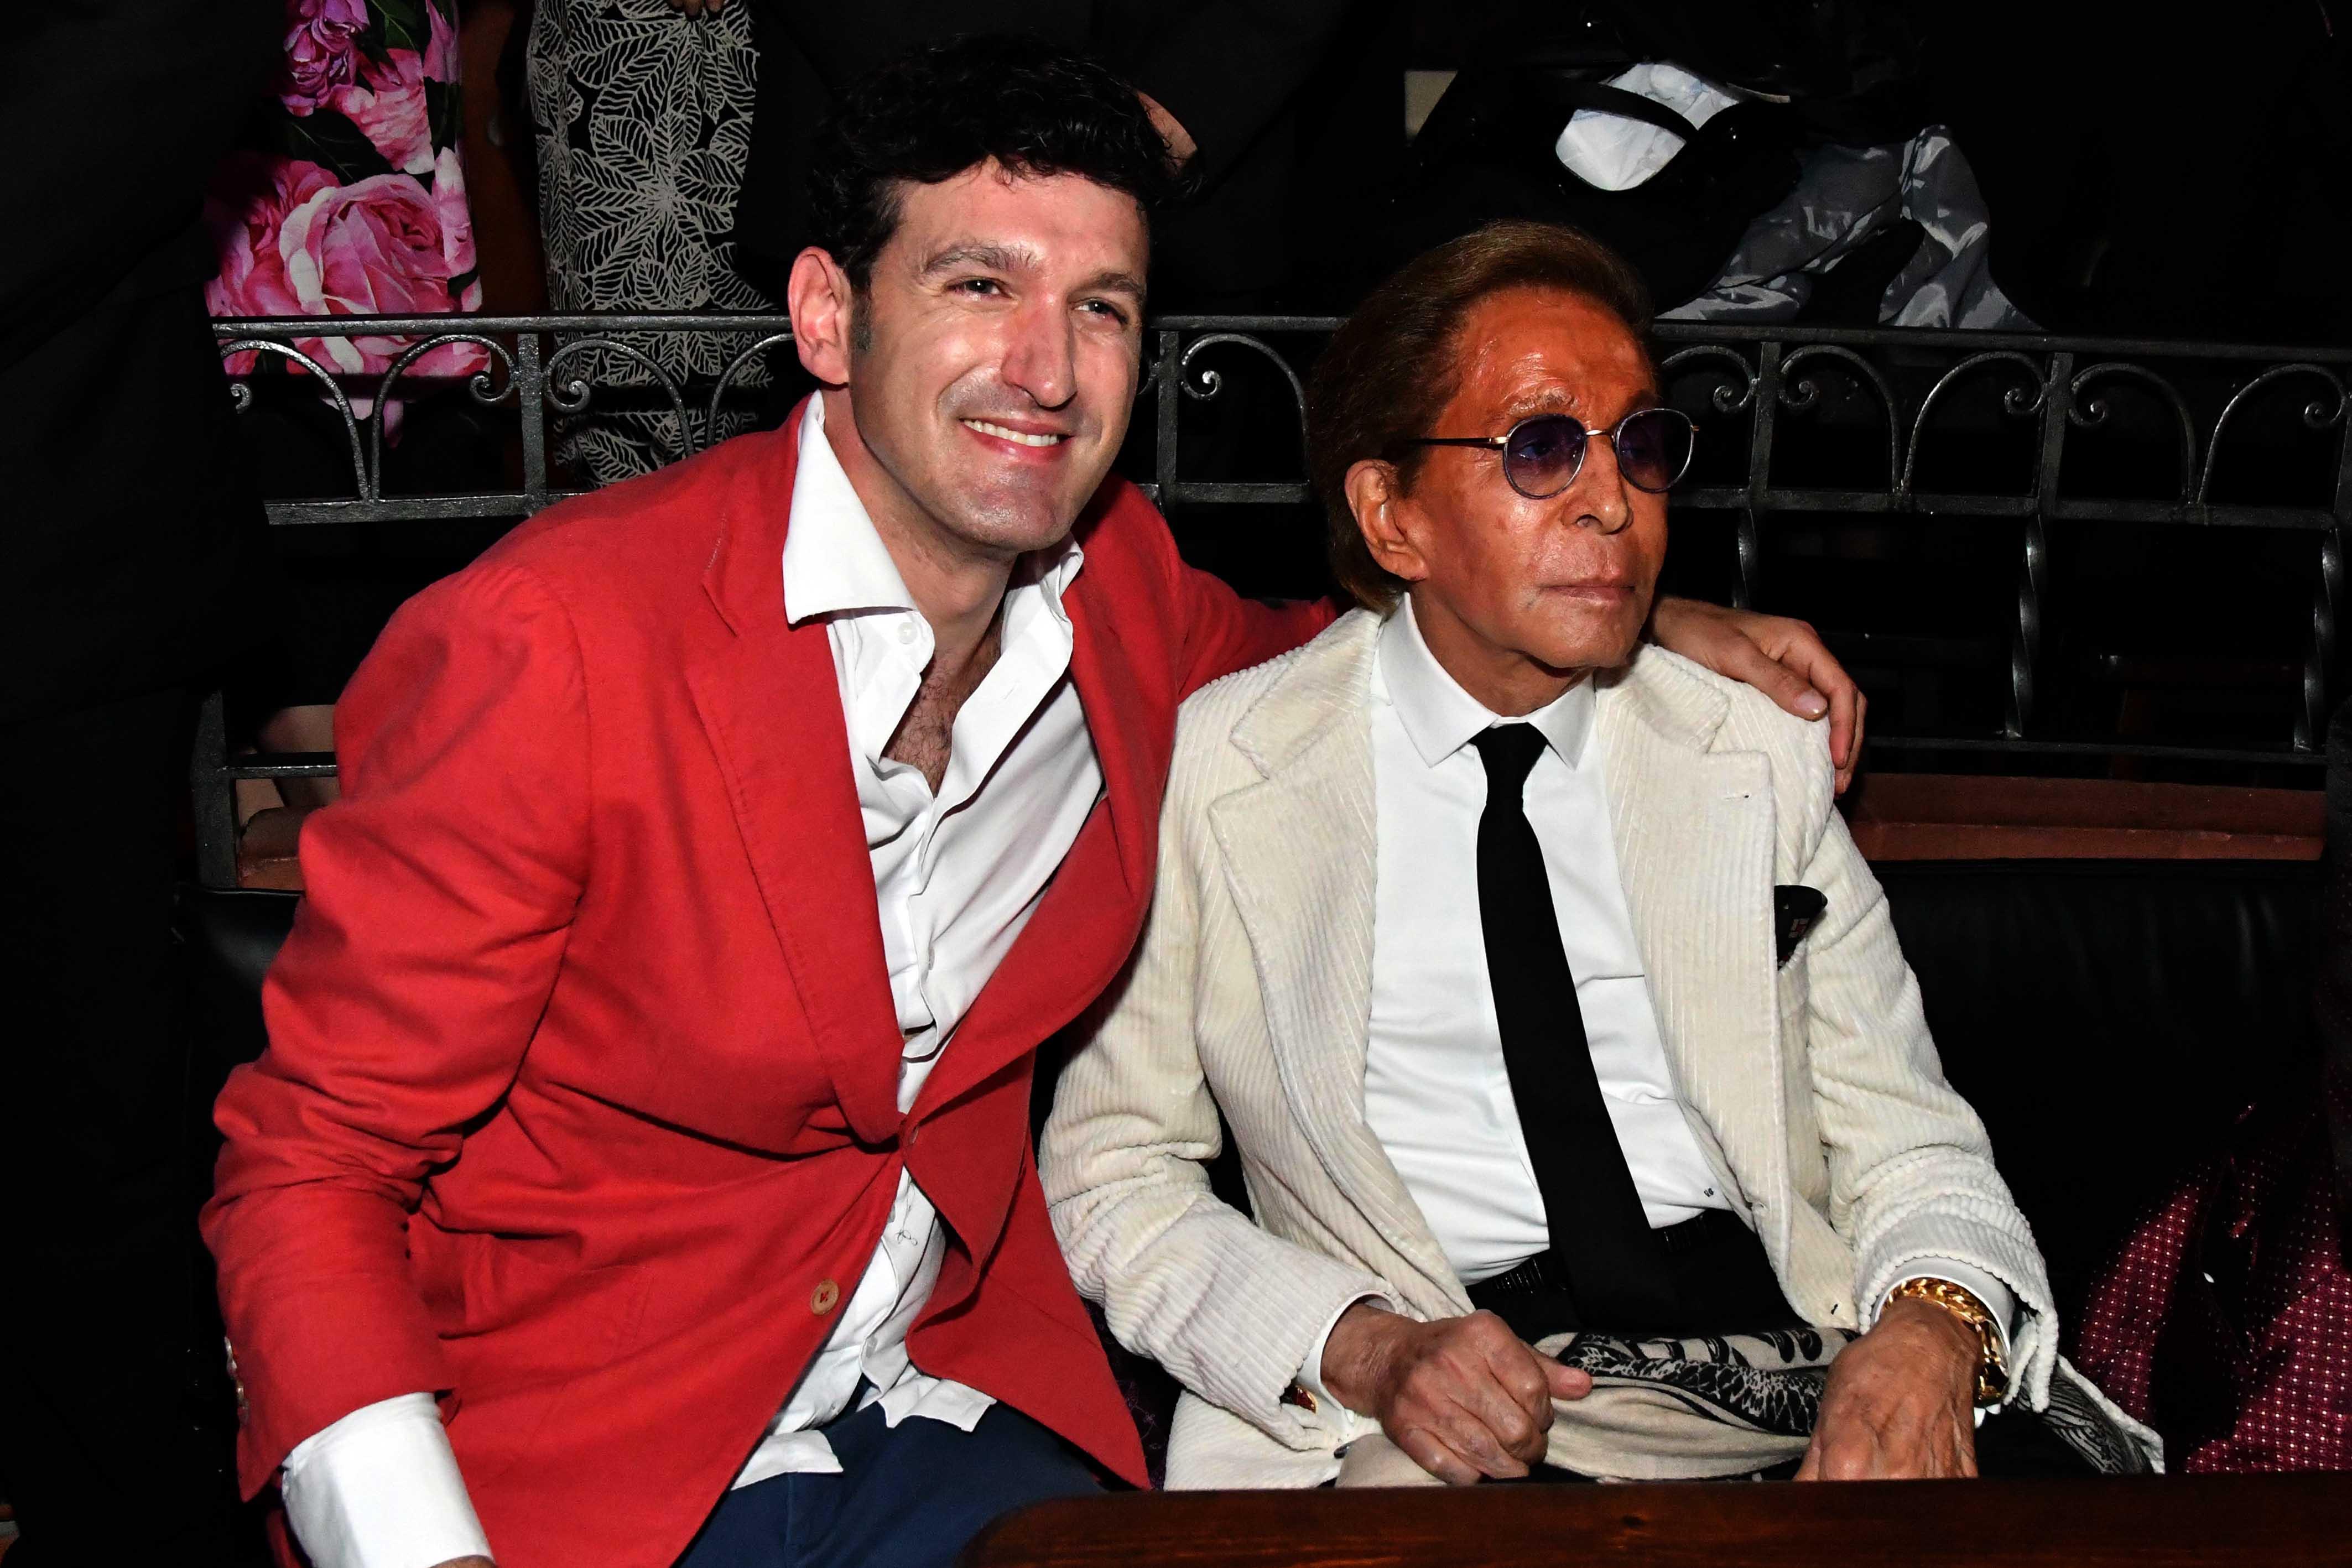 11.05.2019 Capri-Itlay: Valentino's 87th birthday, celebrated at the